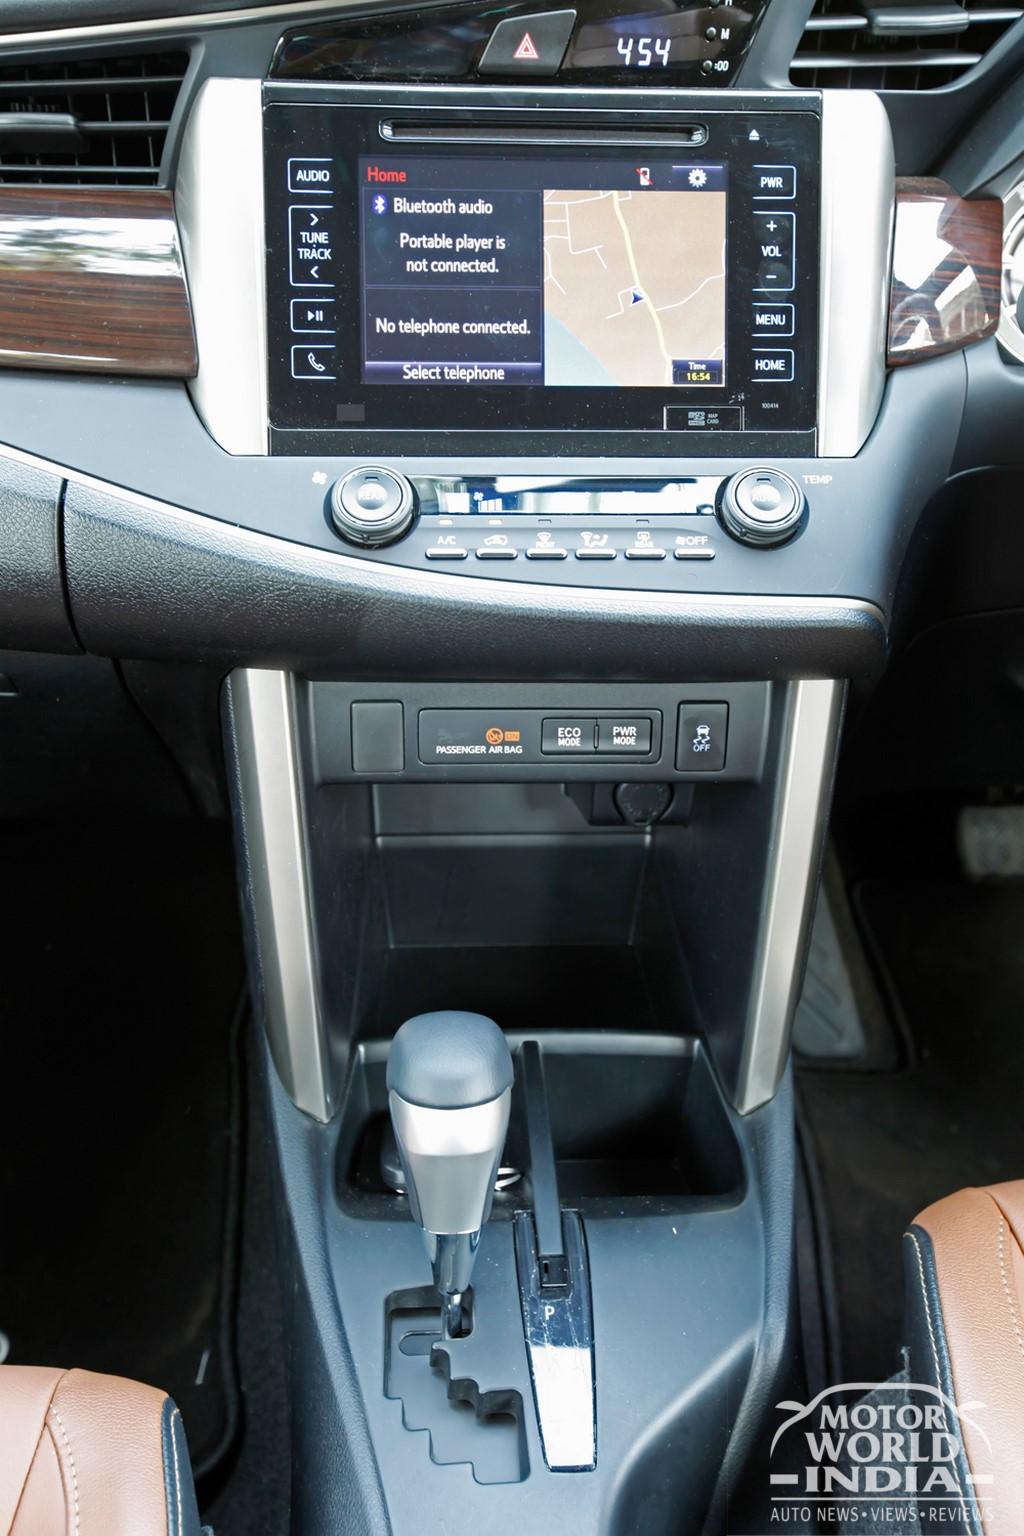 Toyota-Innova-Crysta-Interior-Dashboard (3)